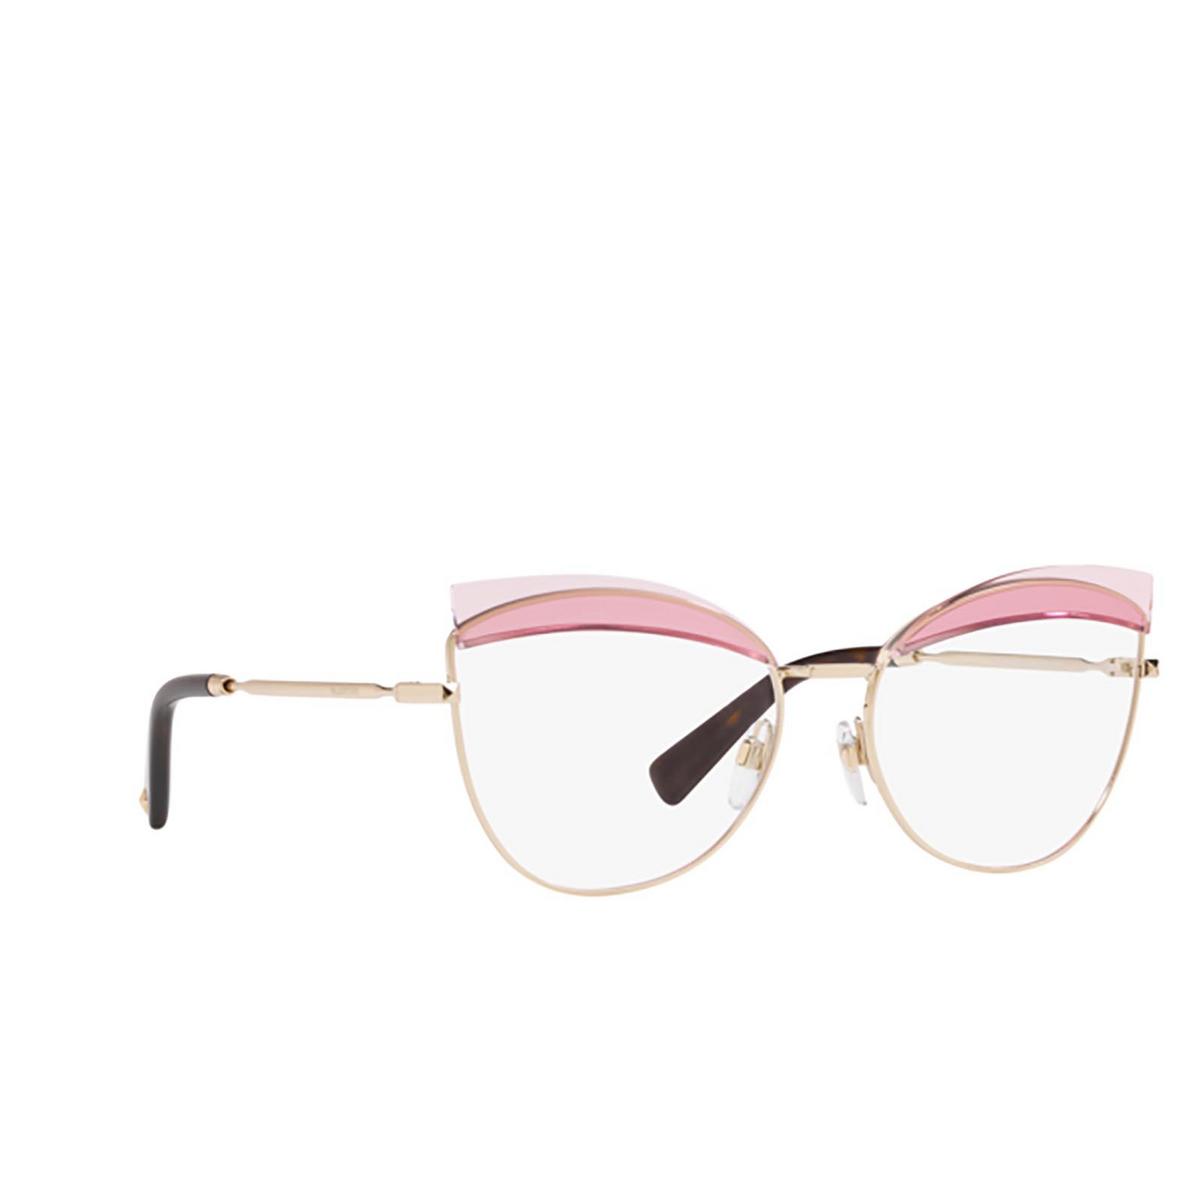 Valentino® Butterfly Eyeglasses: VA1014 color Light Gold 3003 - three-quarters view.